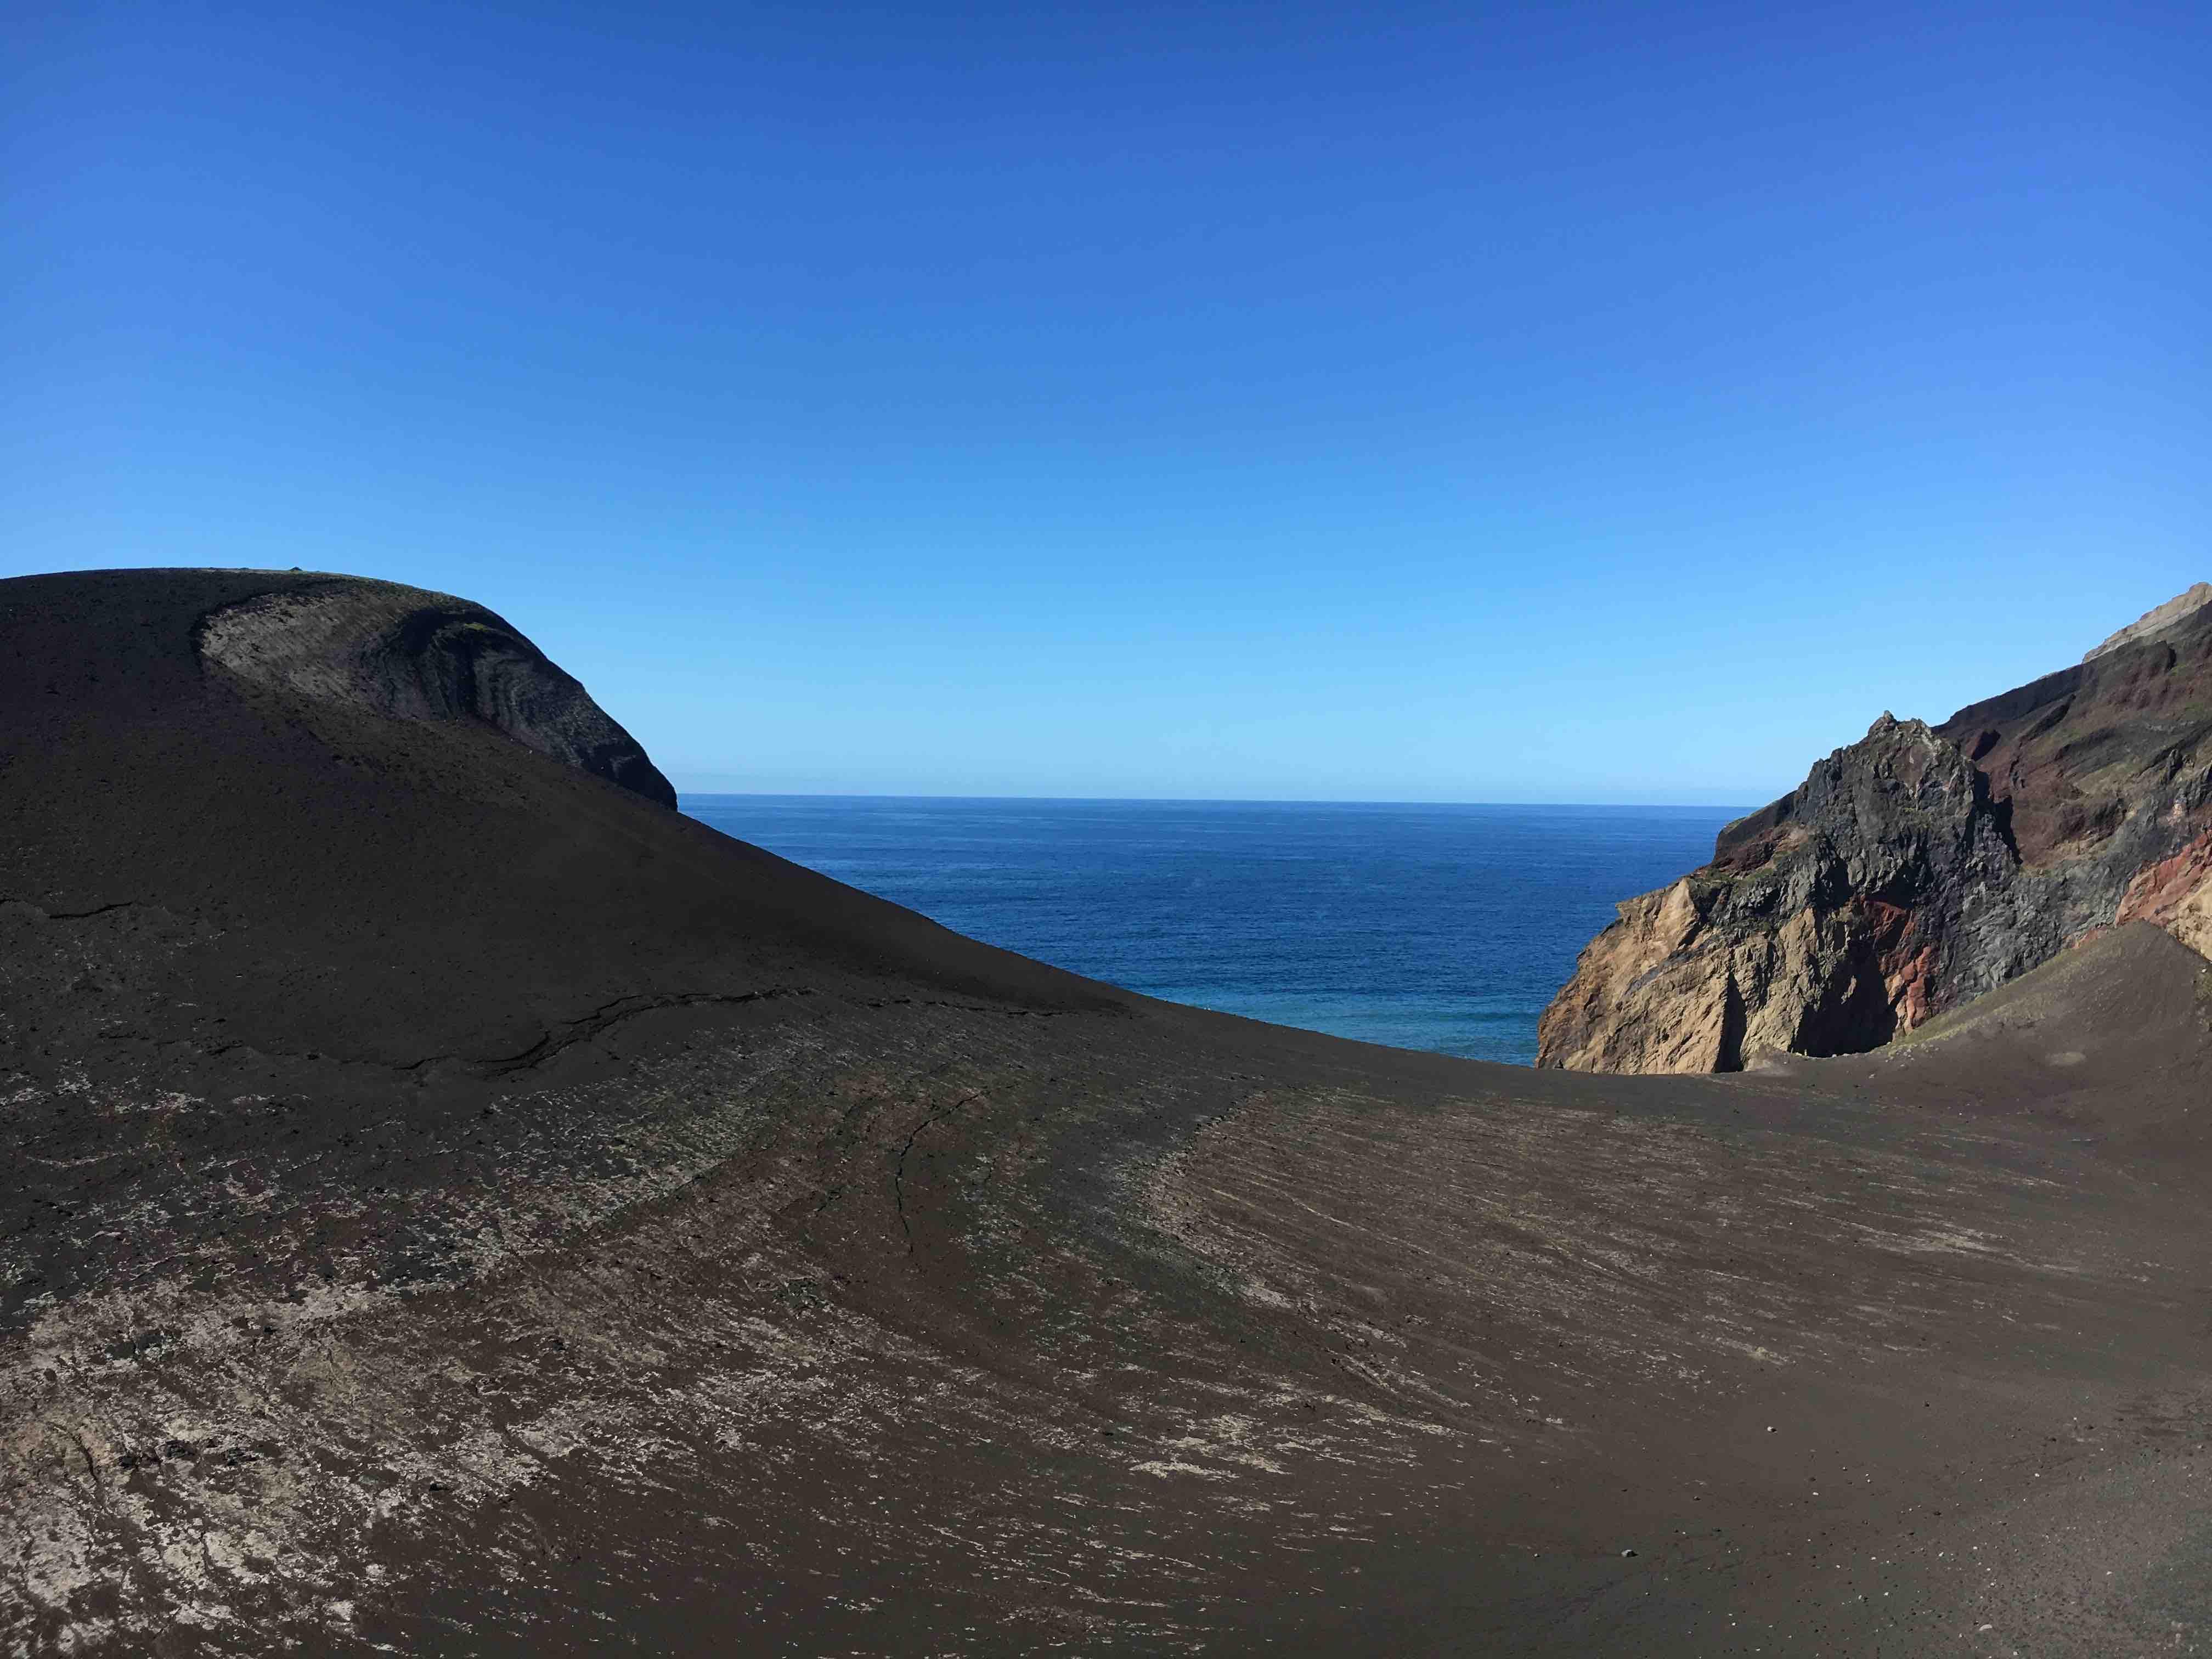 Vulcano di Capelinhos Faial Azzorre